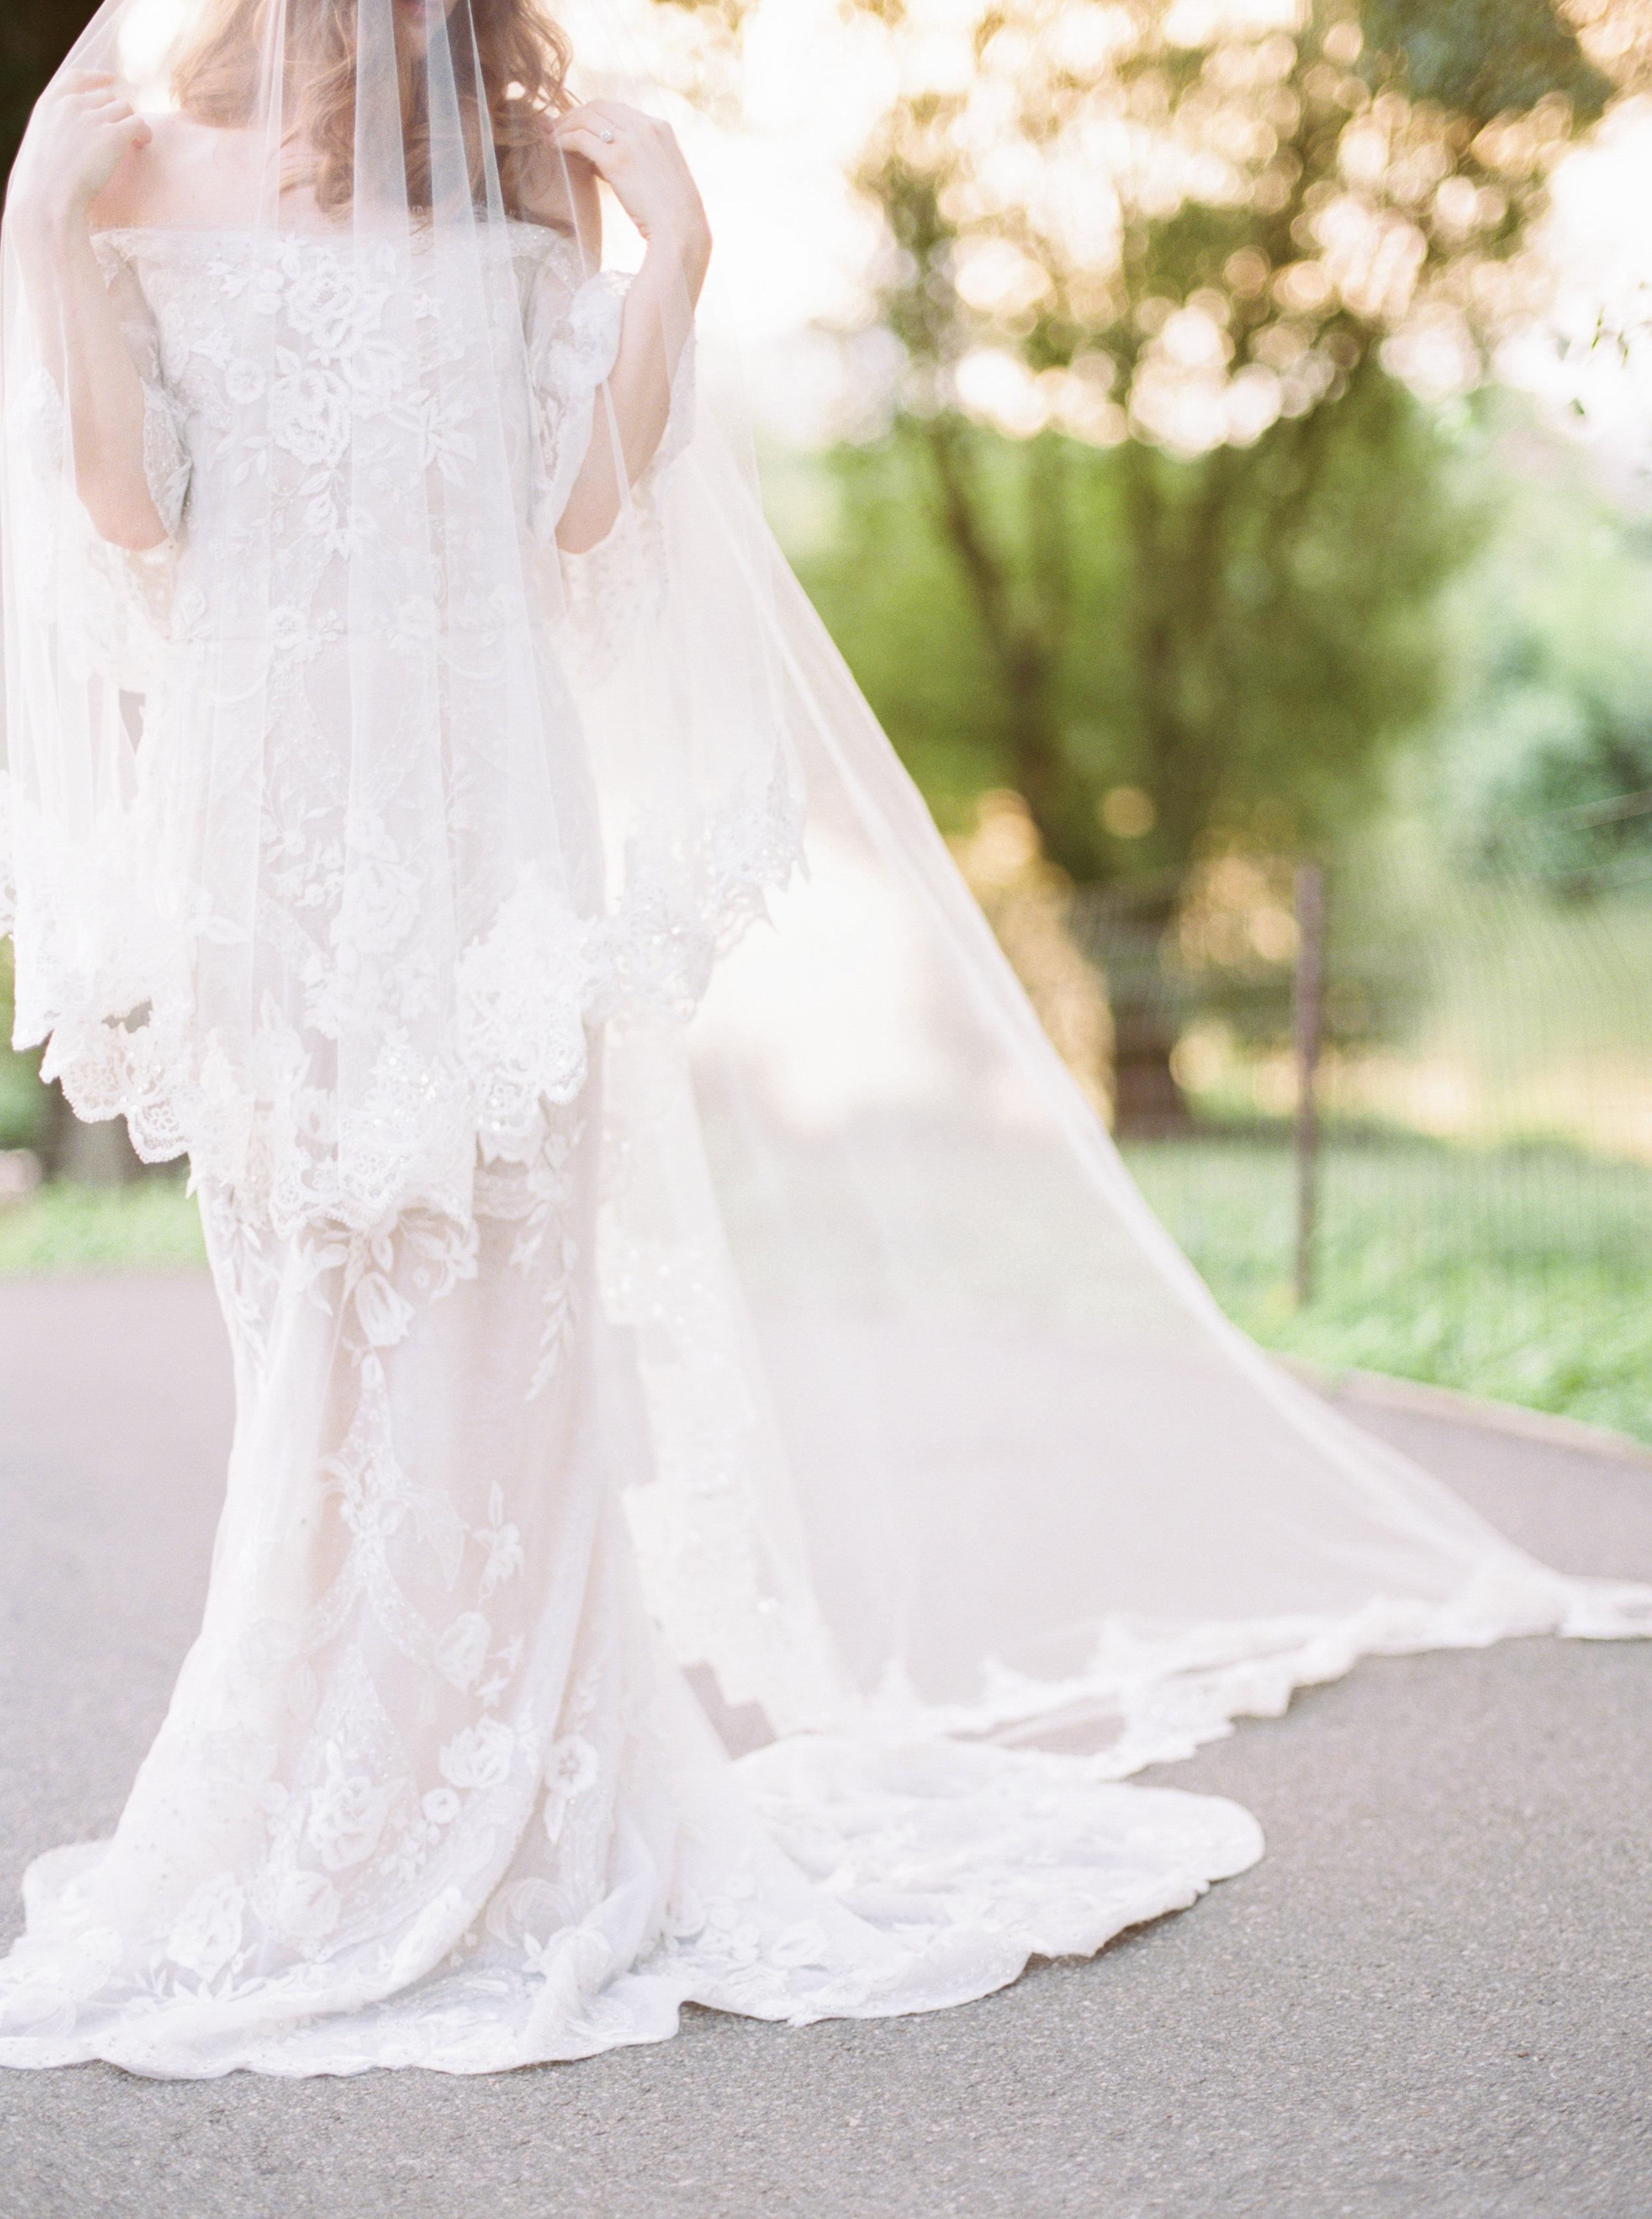 Marchesa Bride in Central Park